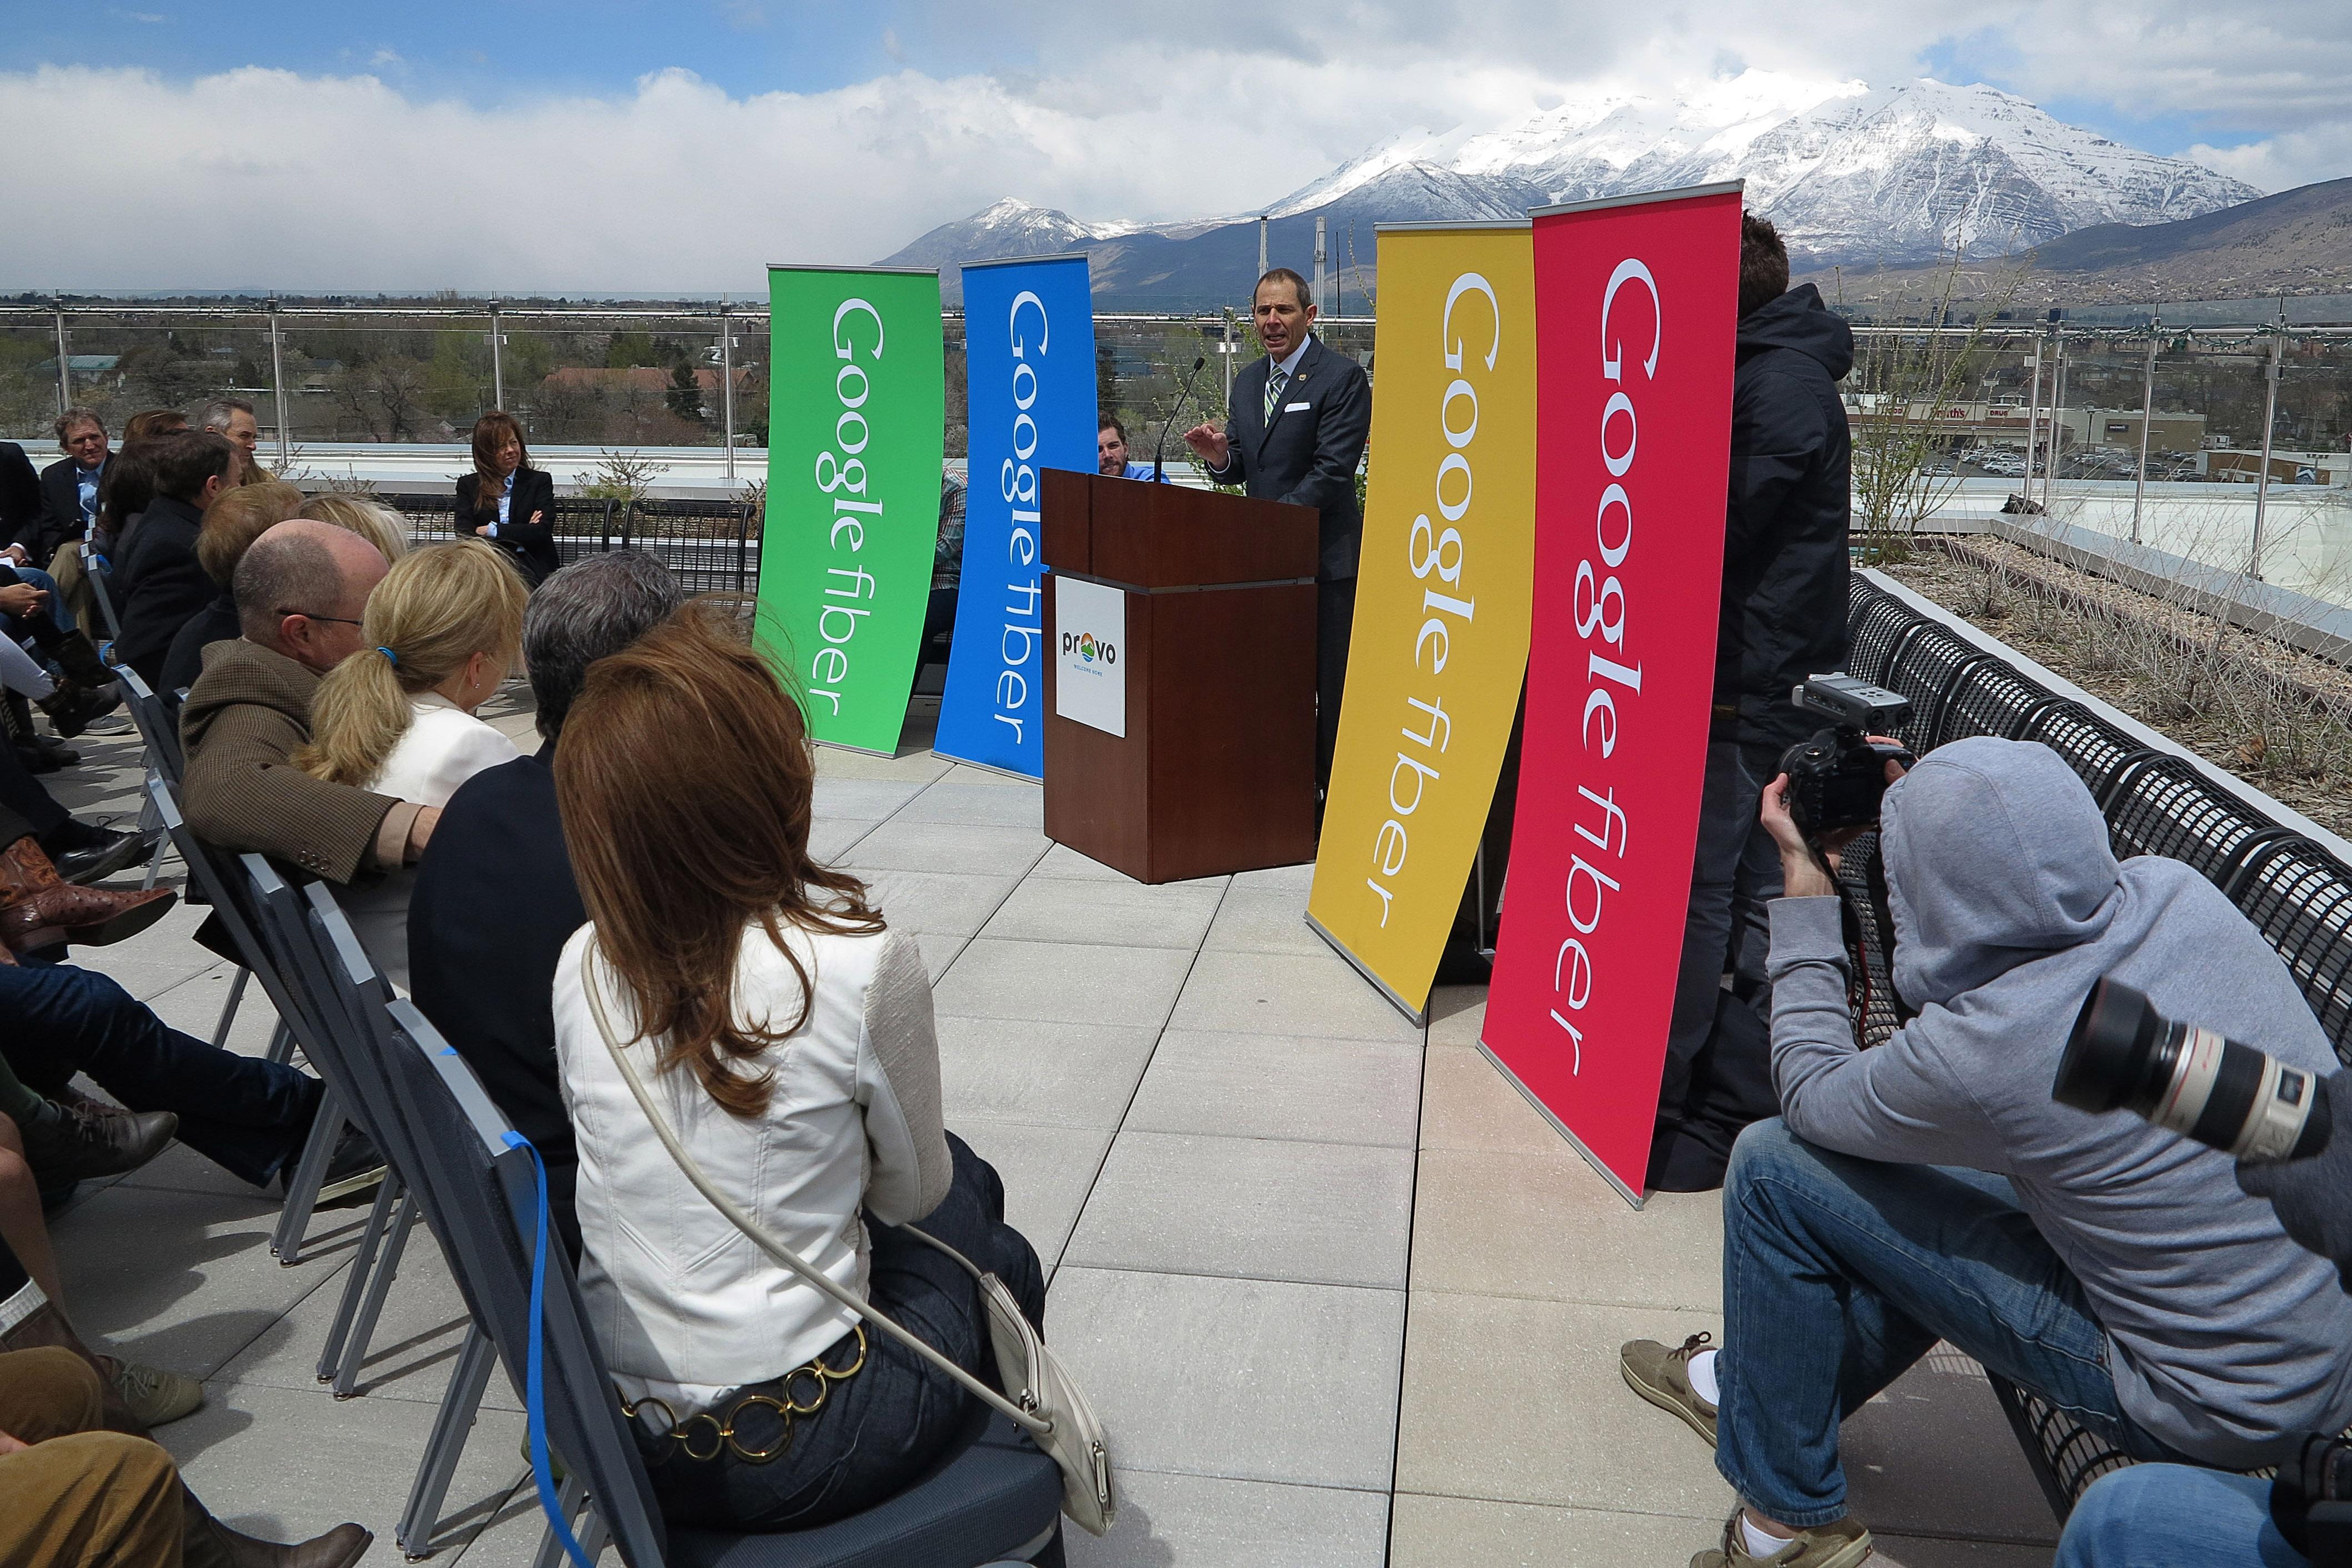 Google's Fiber launch in Provo, UT.